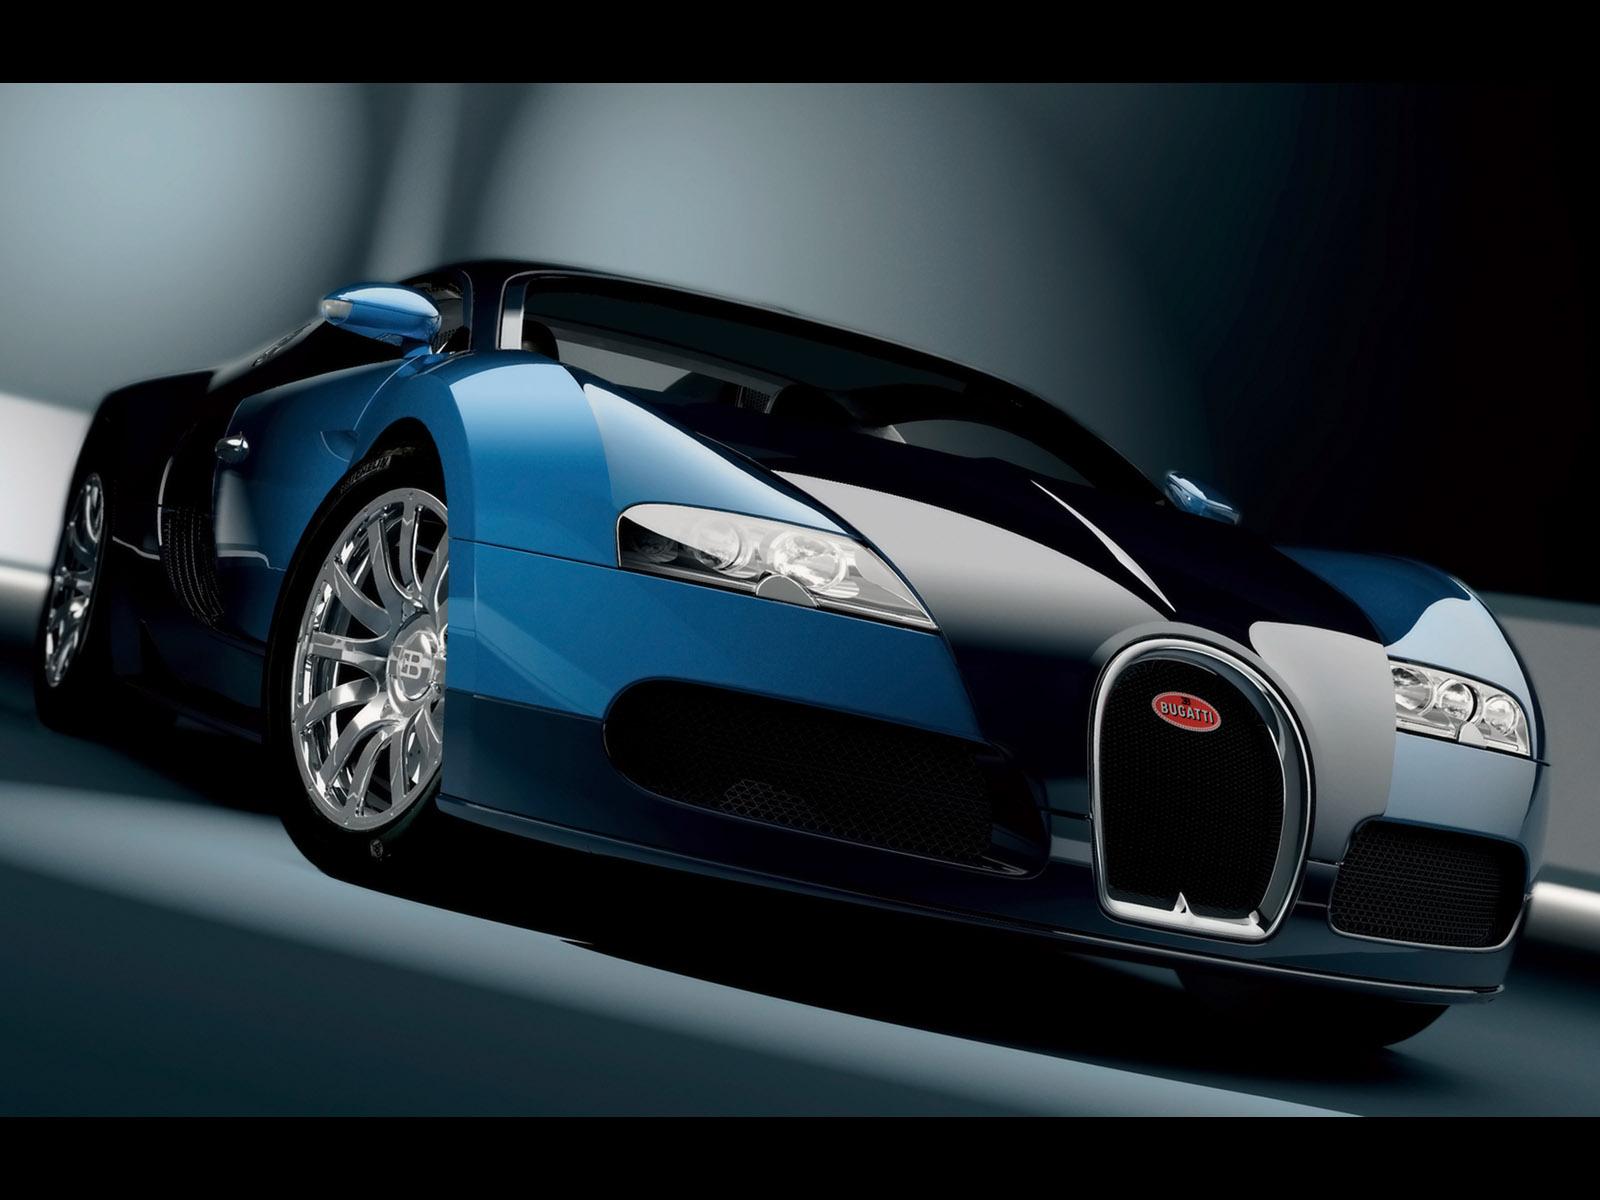 wallpaper bugatti veyron wallpaper bugatti veyron wallpaper bugatti 1600x1200